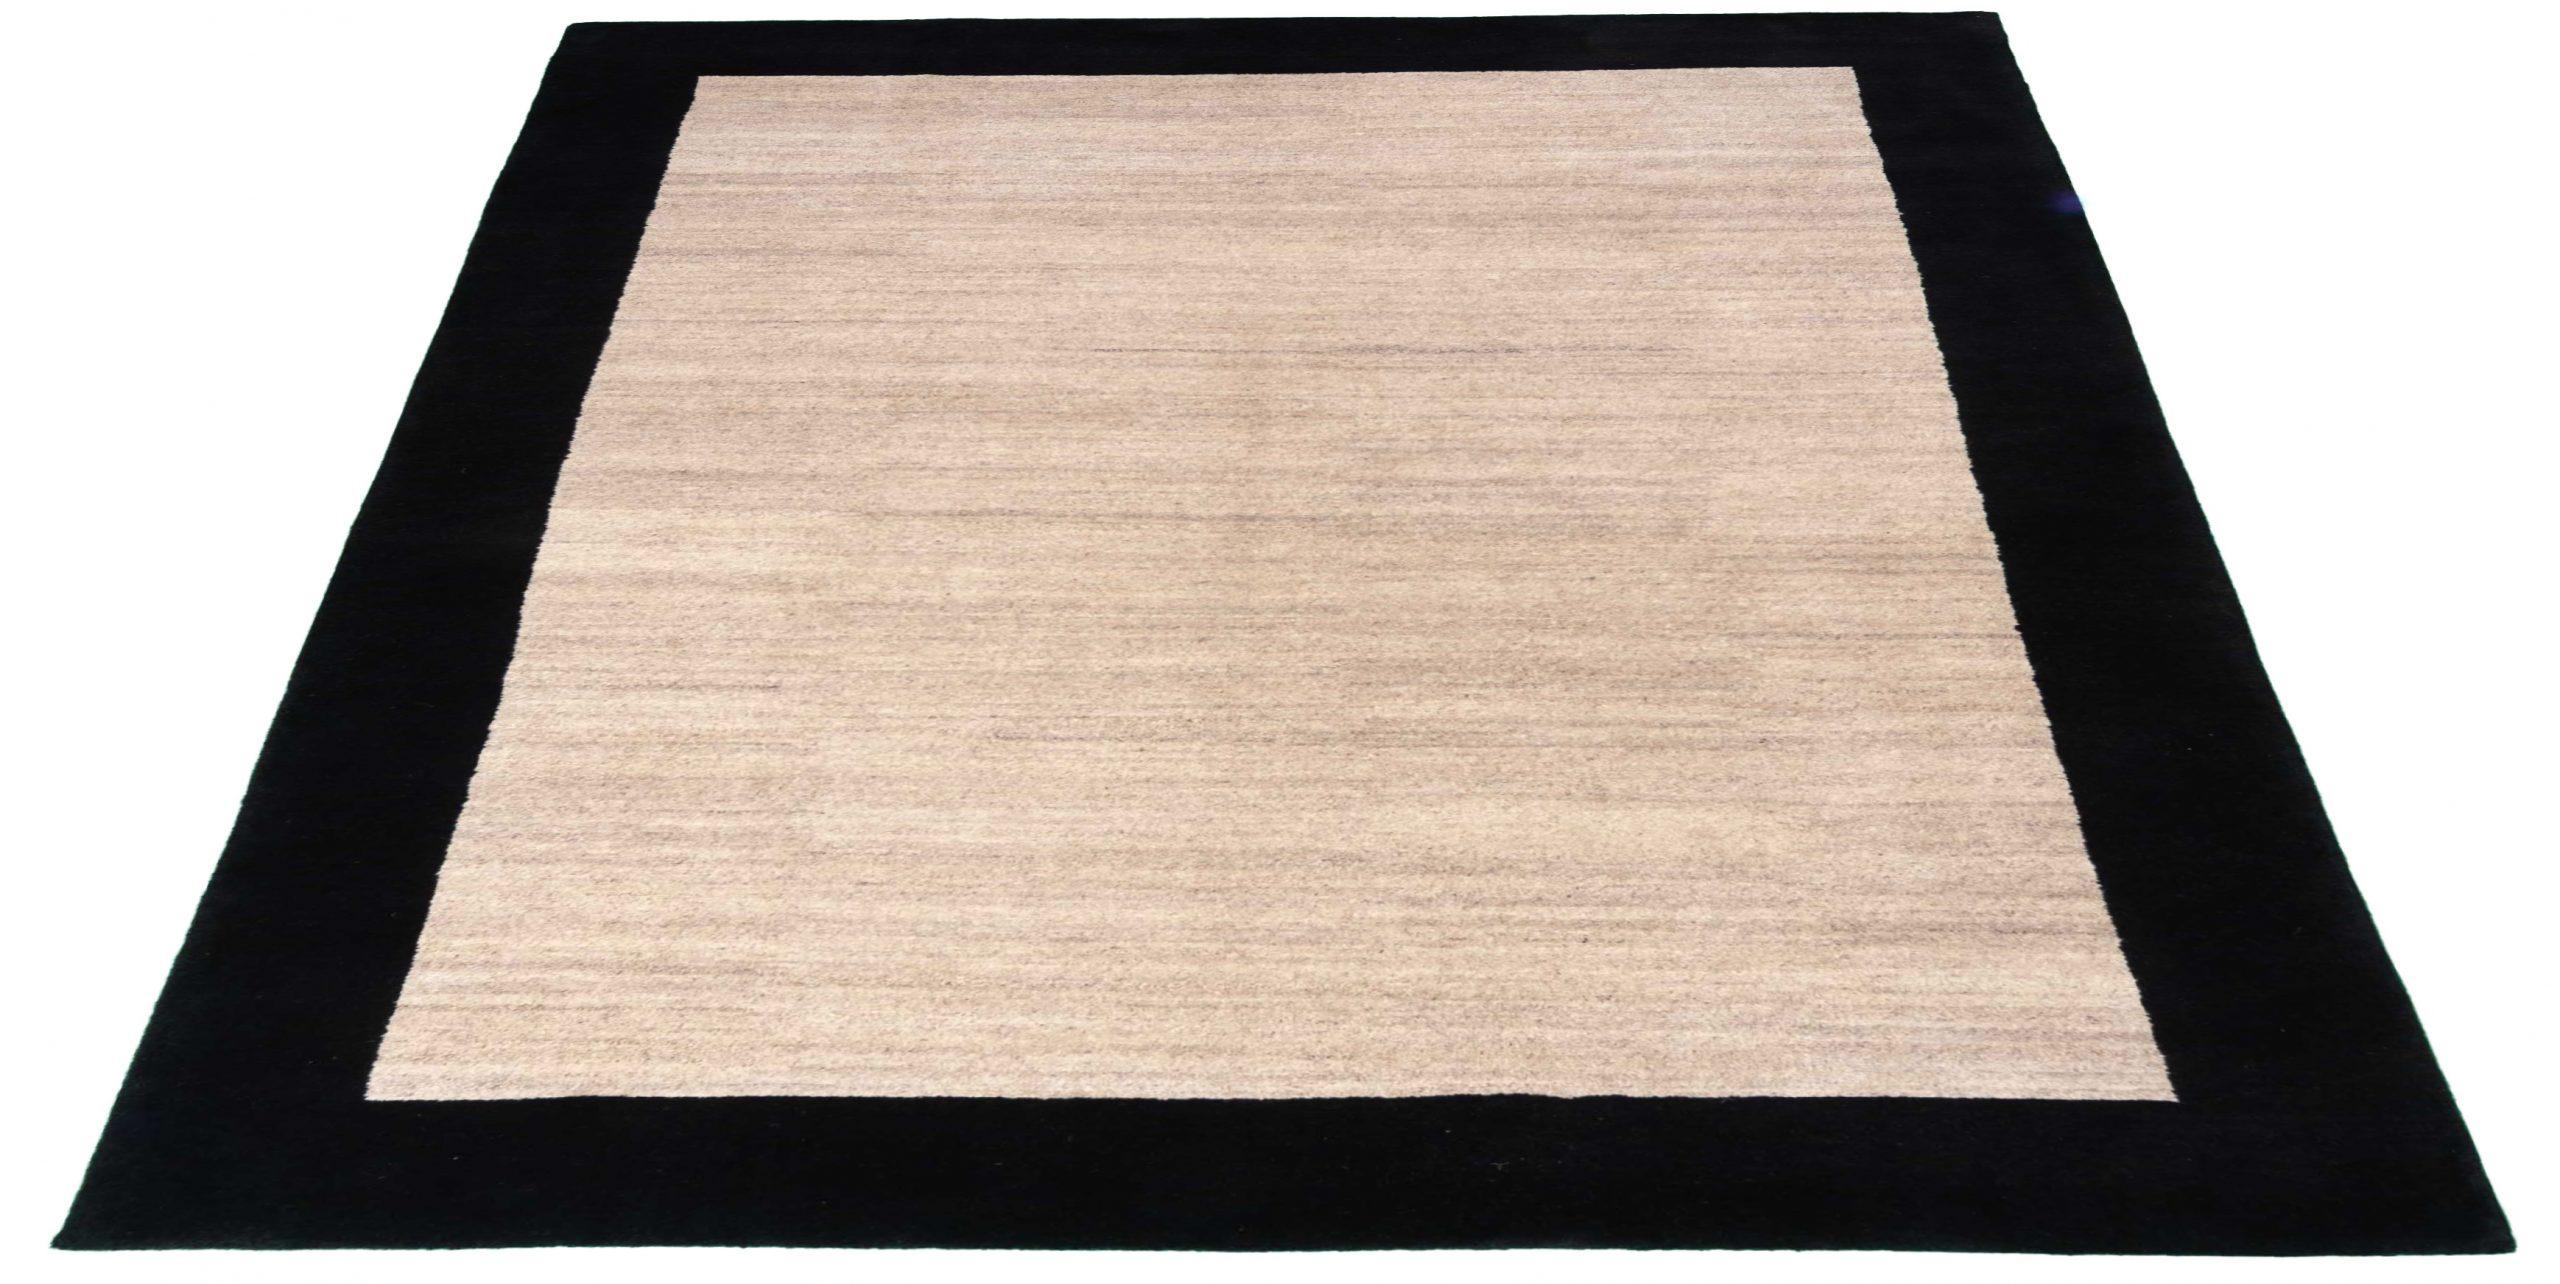 Tappeto-Nepal-Modern-305x203cm-prospettiva